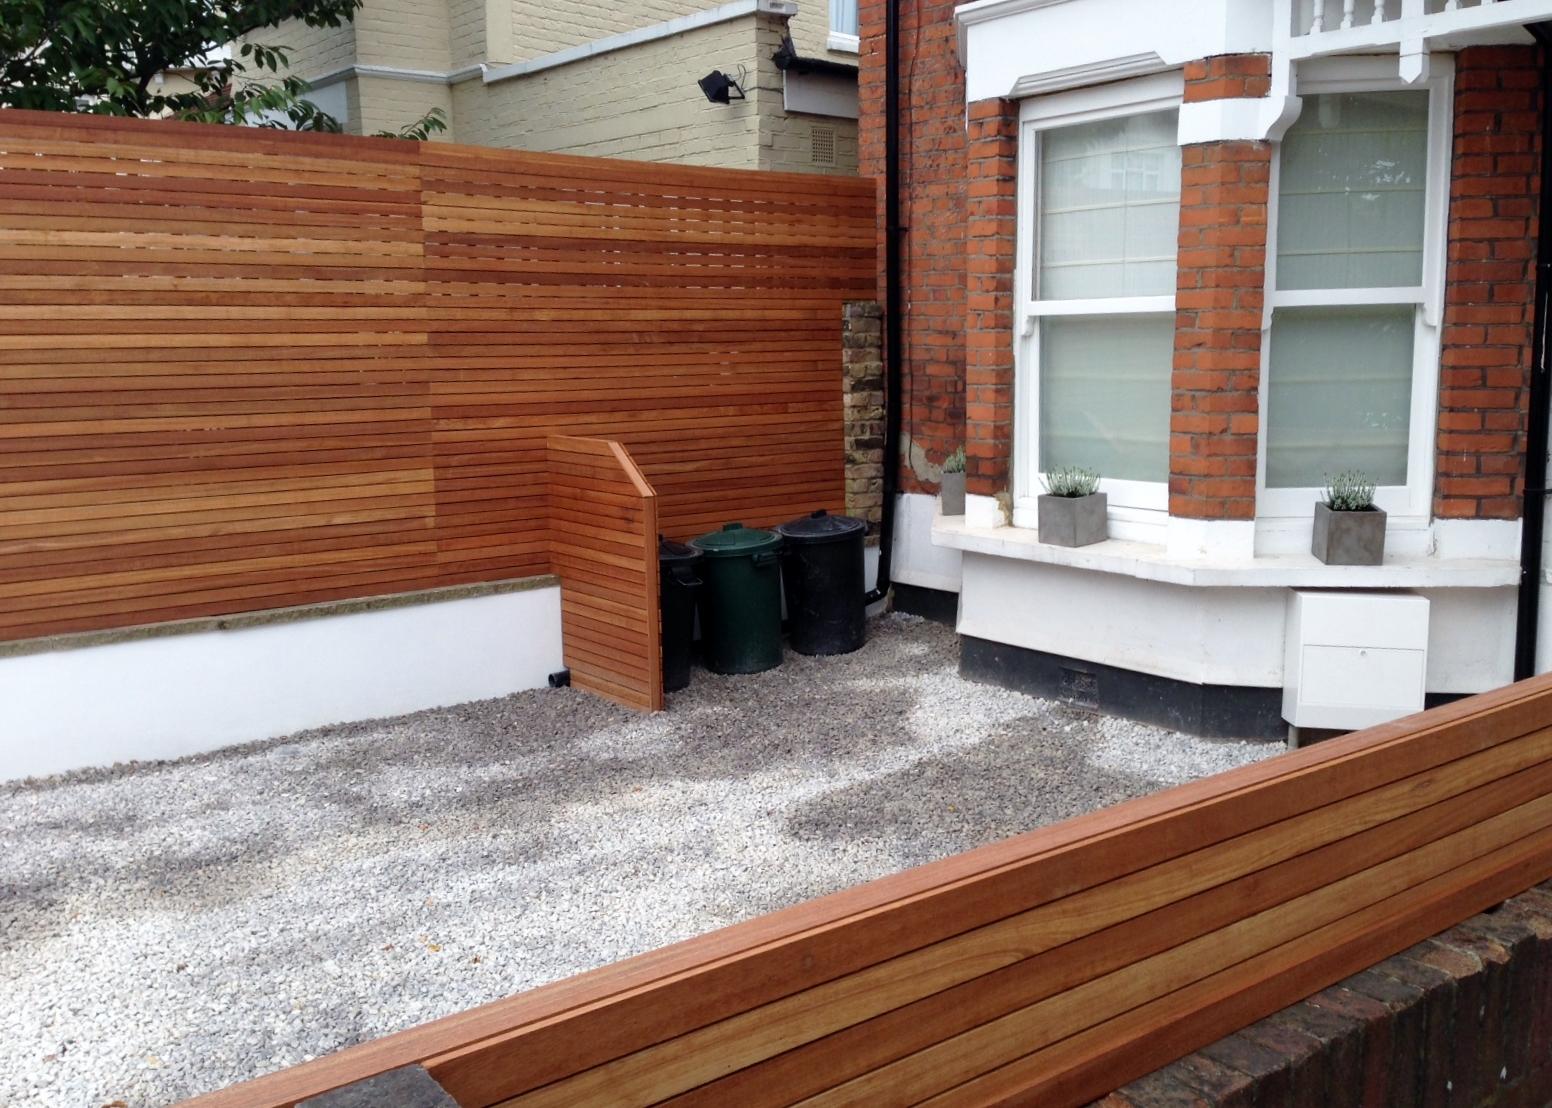 front garden drivewat gravel travertine paving path hardwood privacy screen trellis tooting london (25)